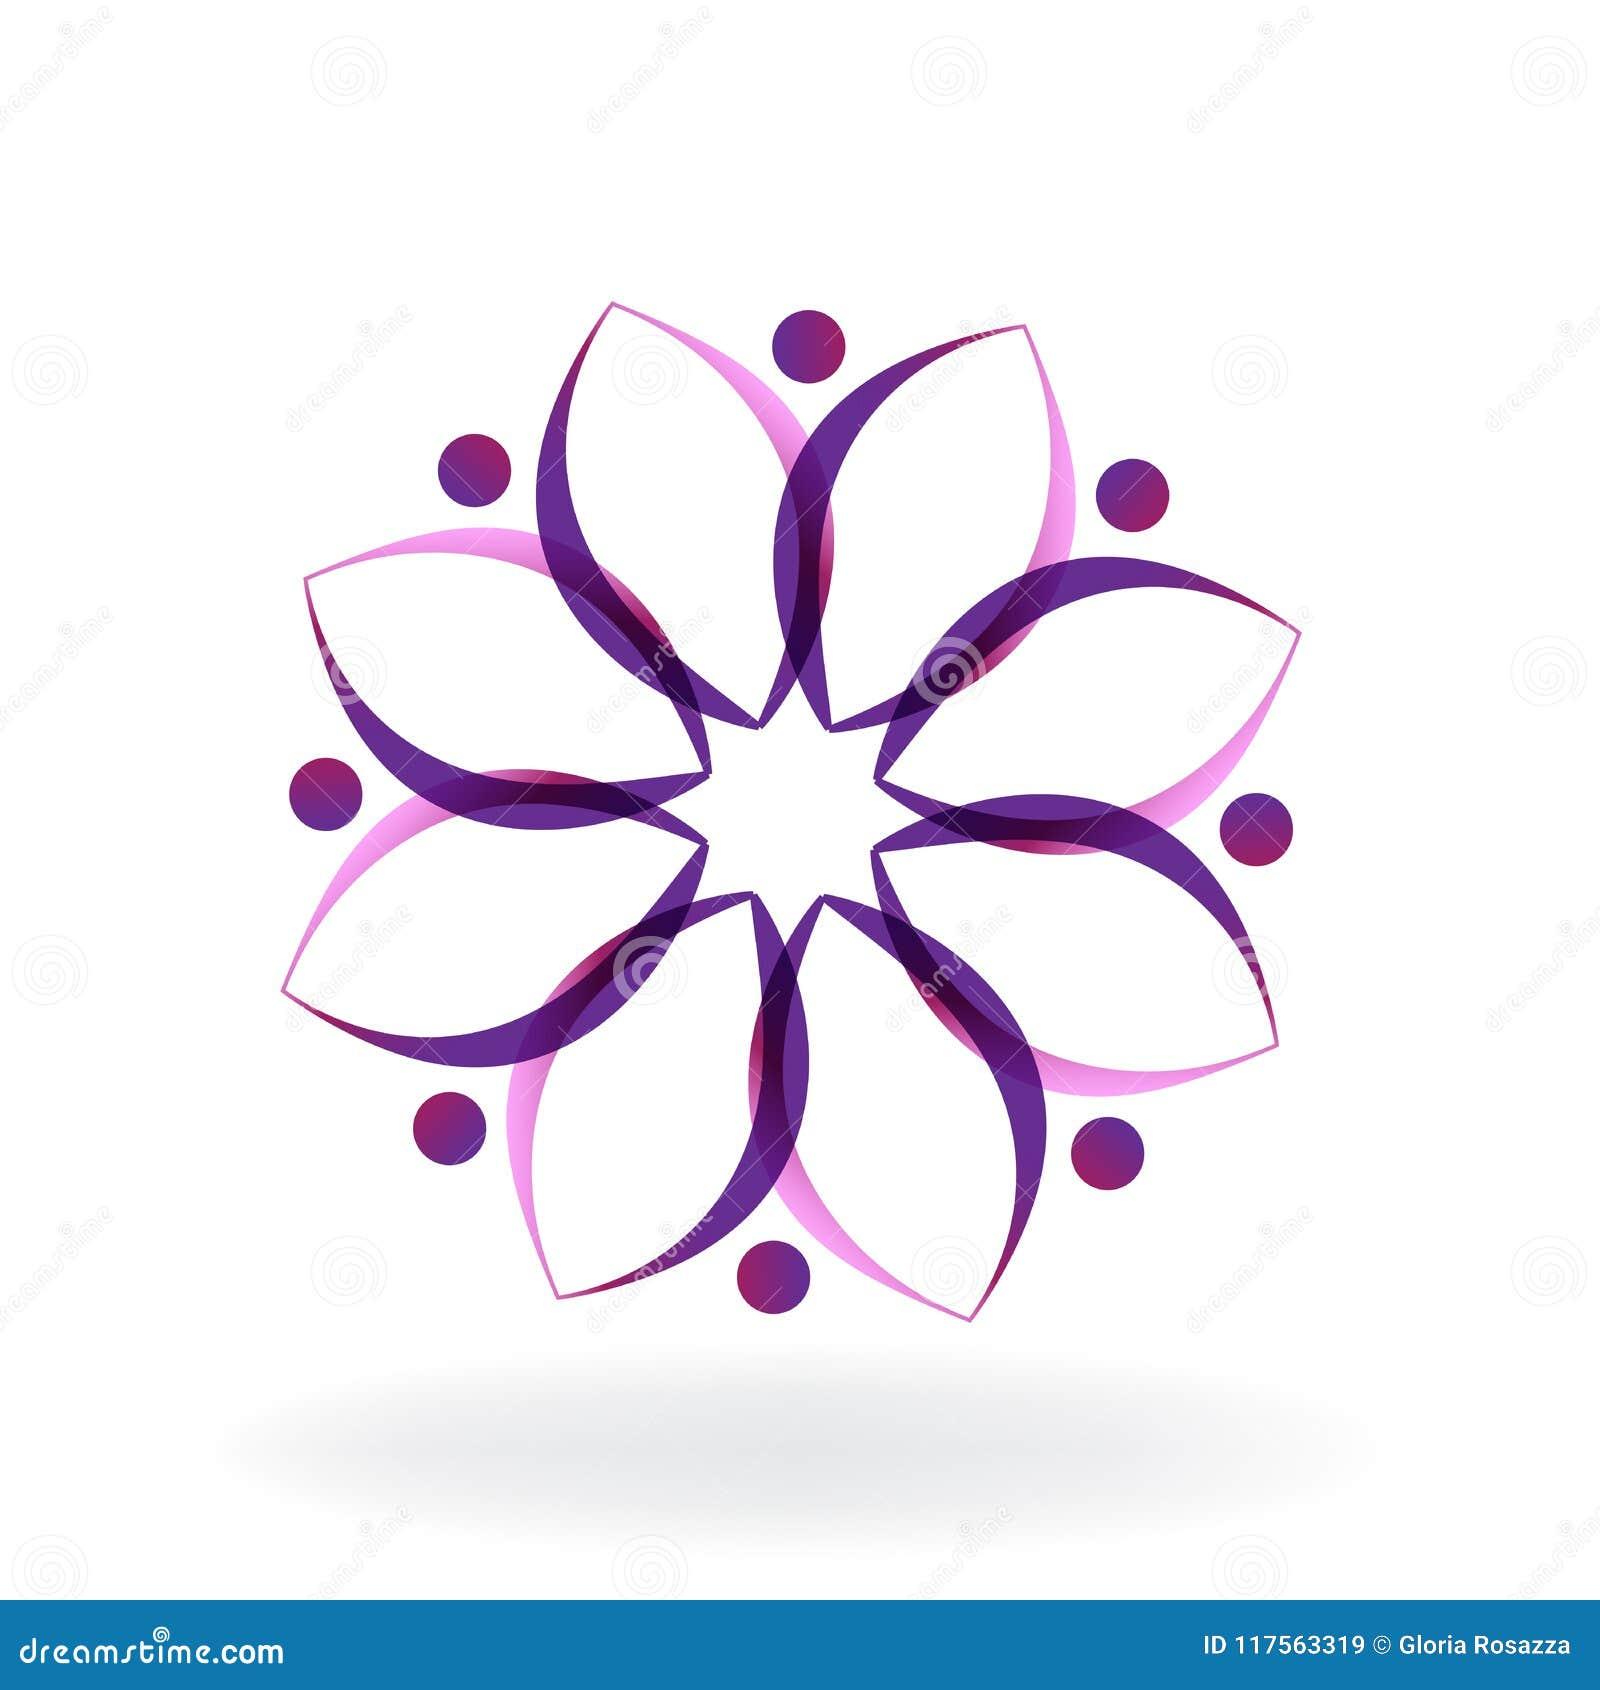 Logo lotus flower yoga teamwork vector image illustration graphic logo lotus flower yoga teamwork vector image illustration graphic design izmirmasajfo